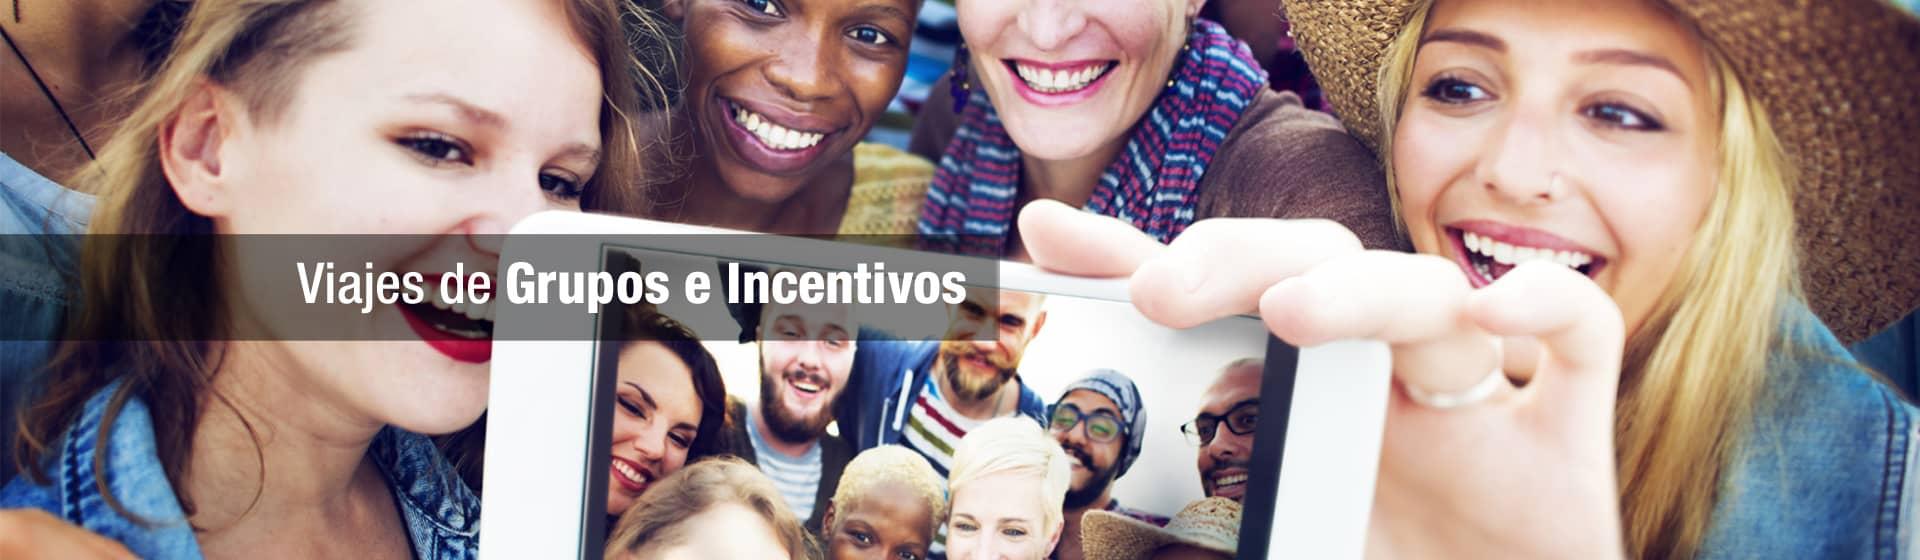 Viajes en Grupo e Incentivos